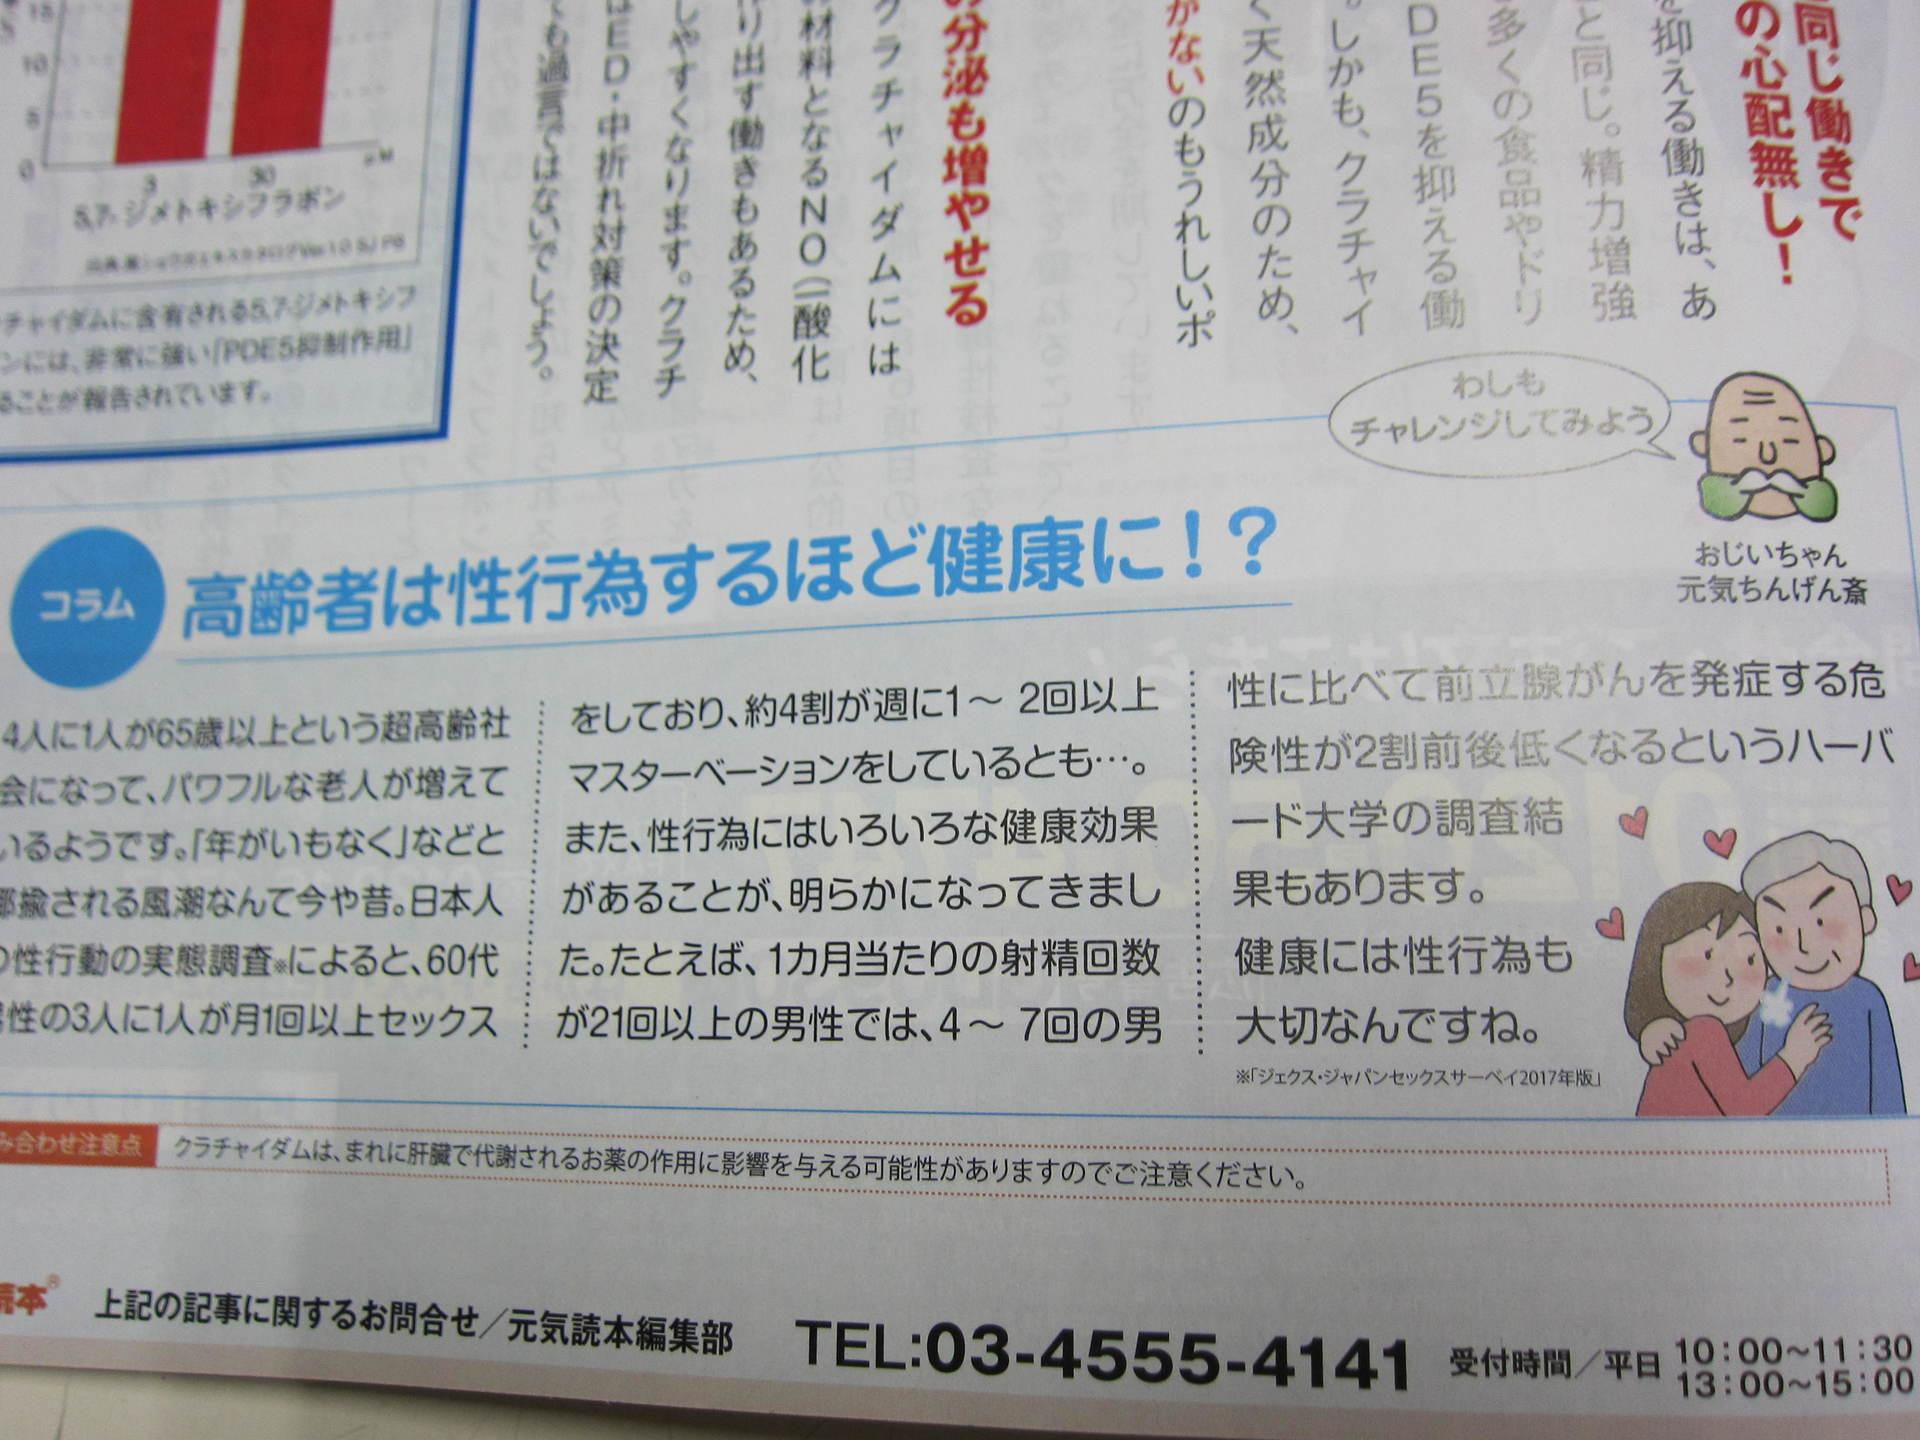 IMG_0015-003.JPG